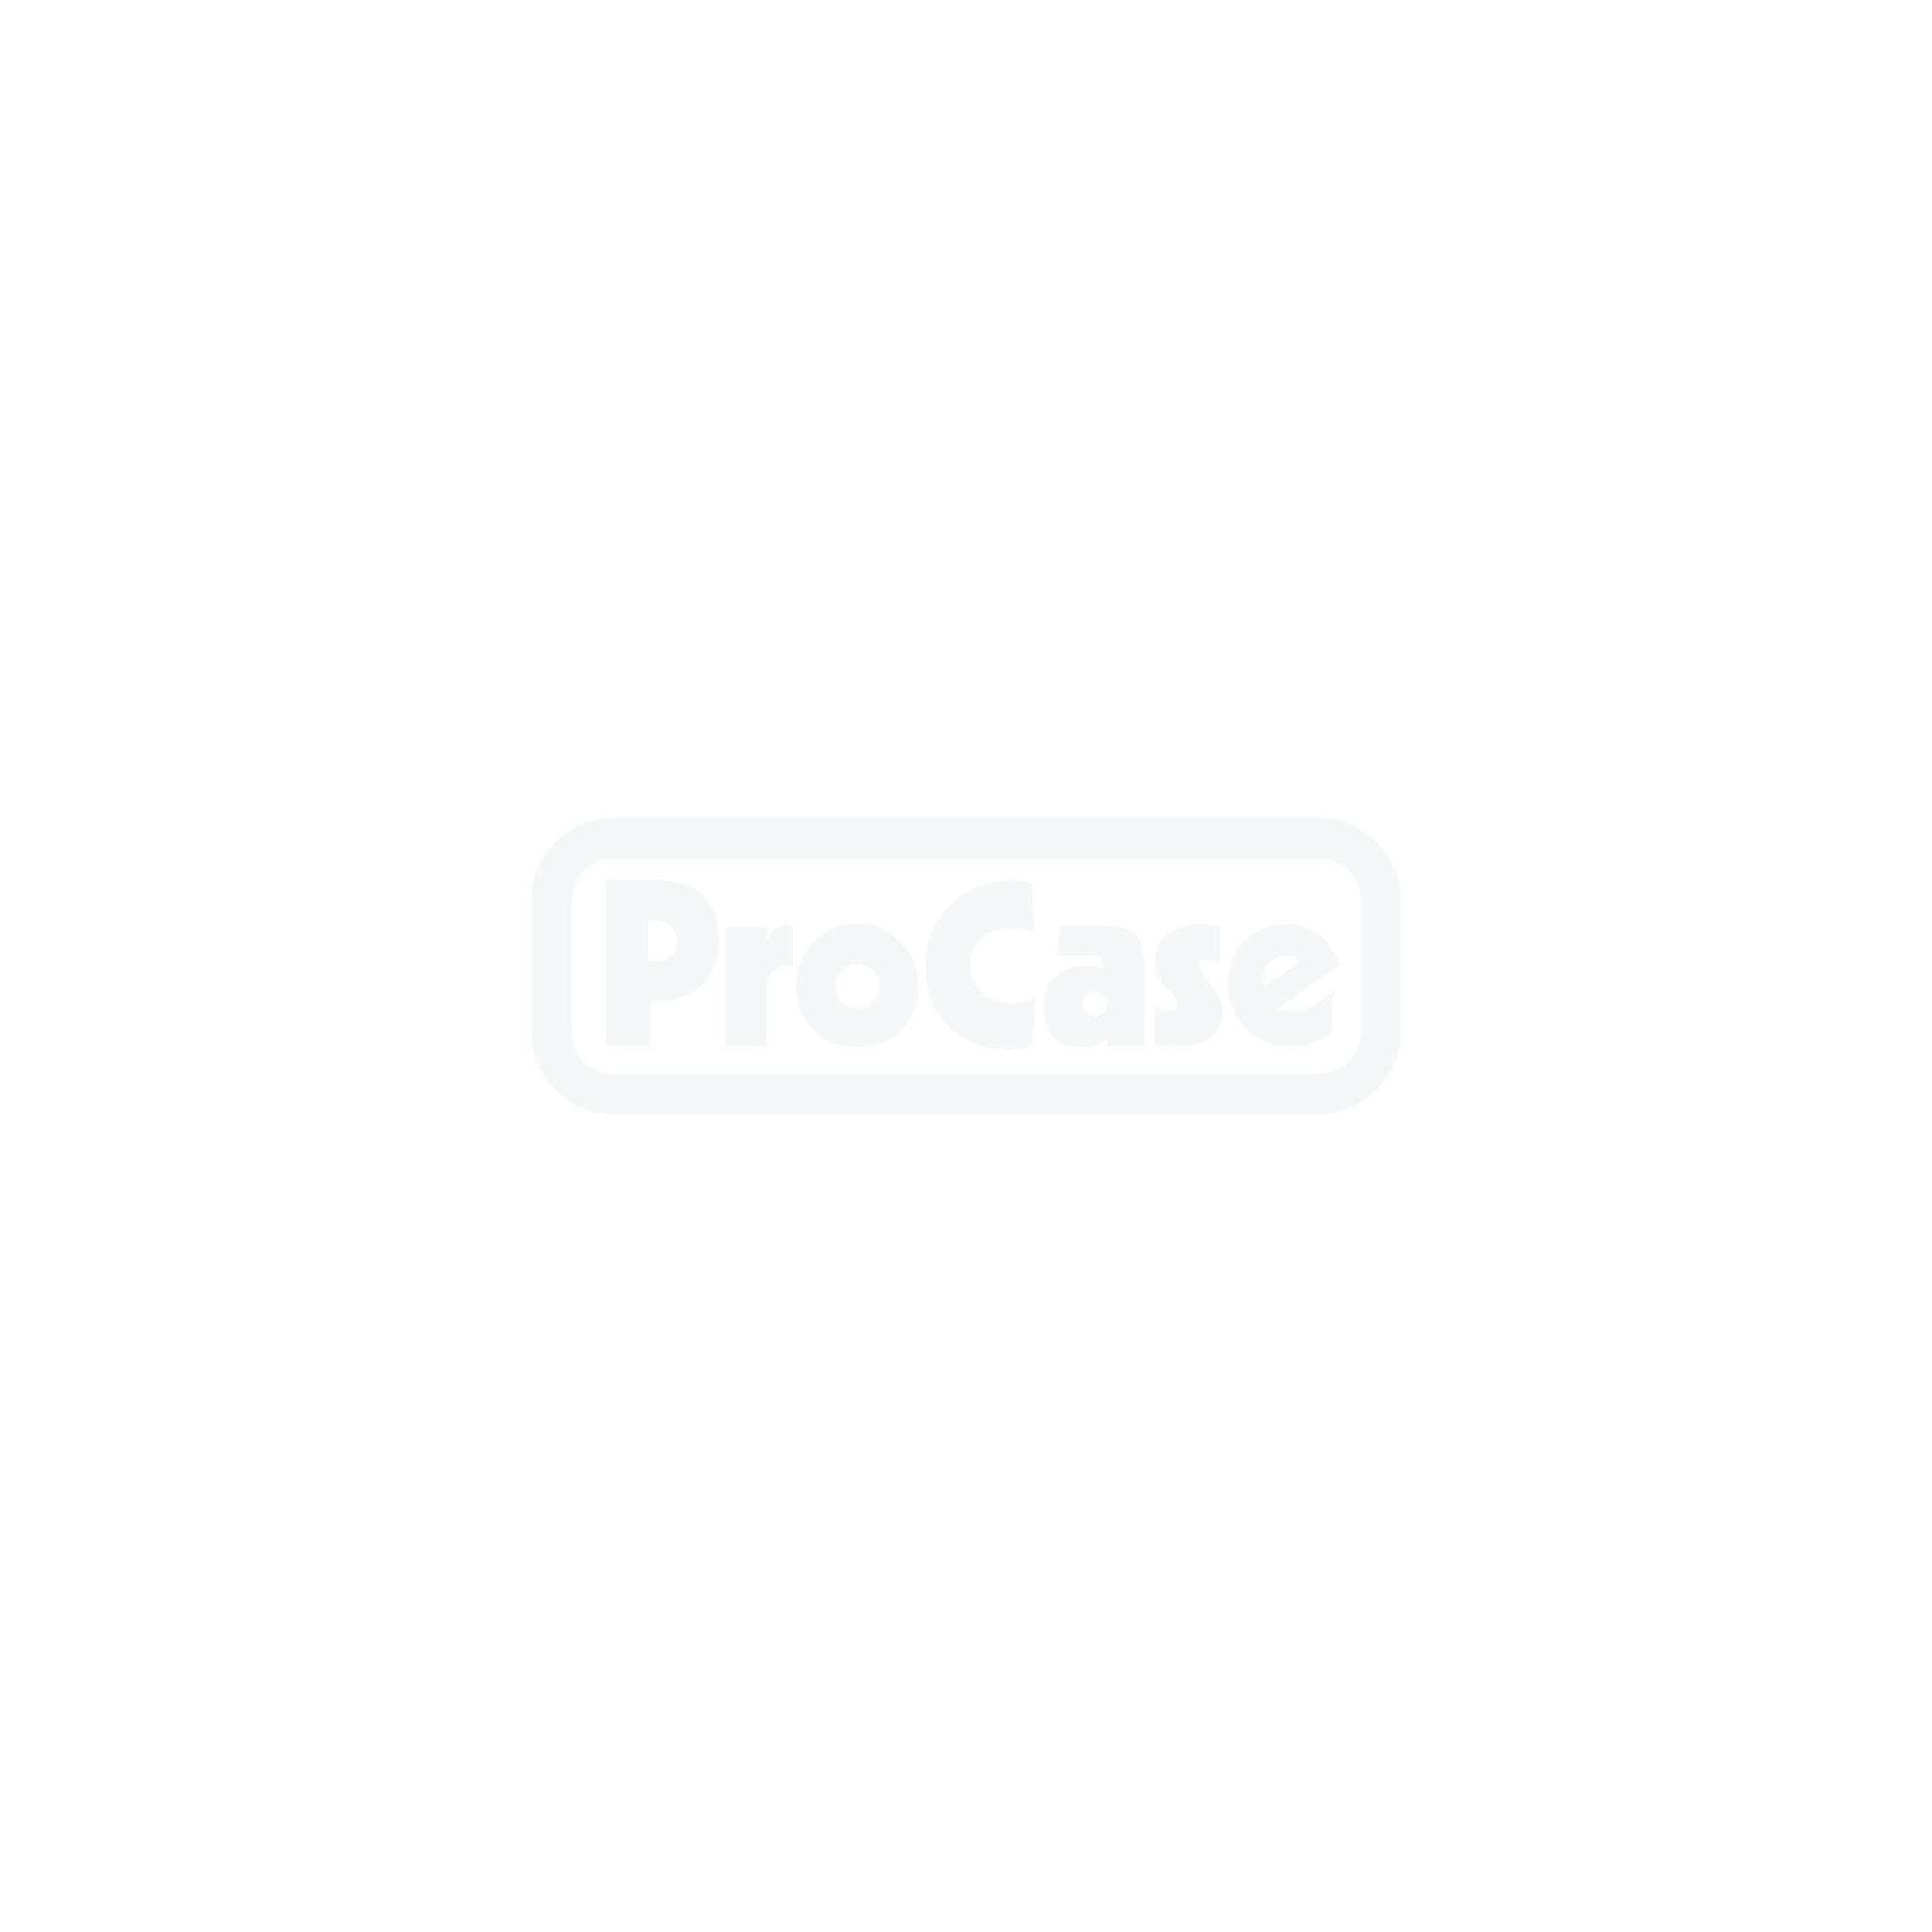 Flightcase für JB Lighting Varyscan P3 Spot & Wash 3